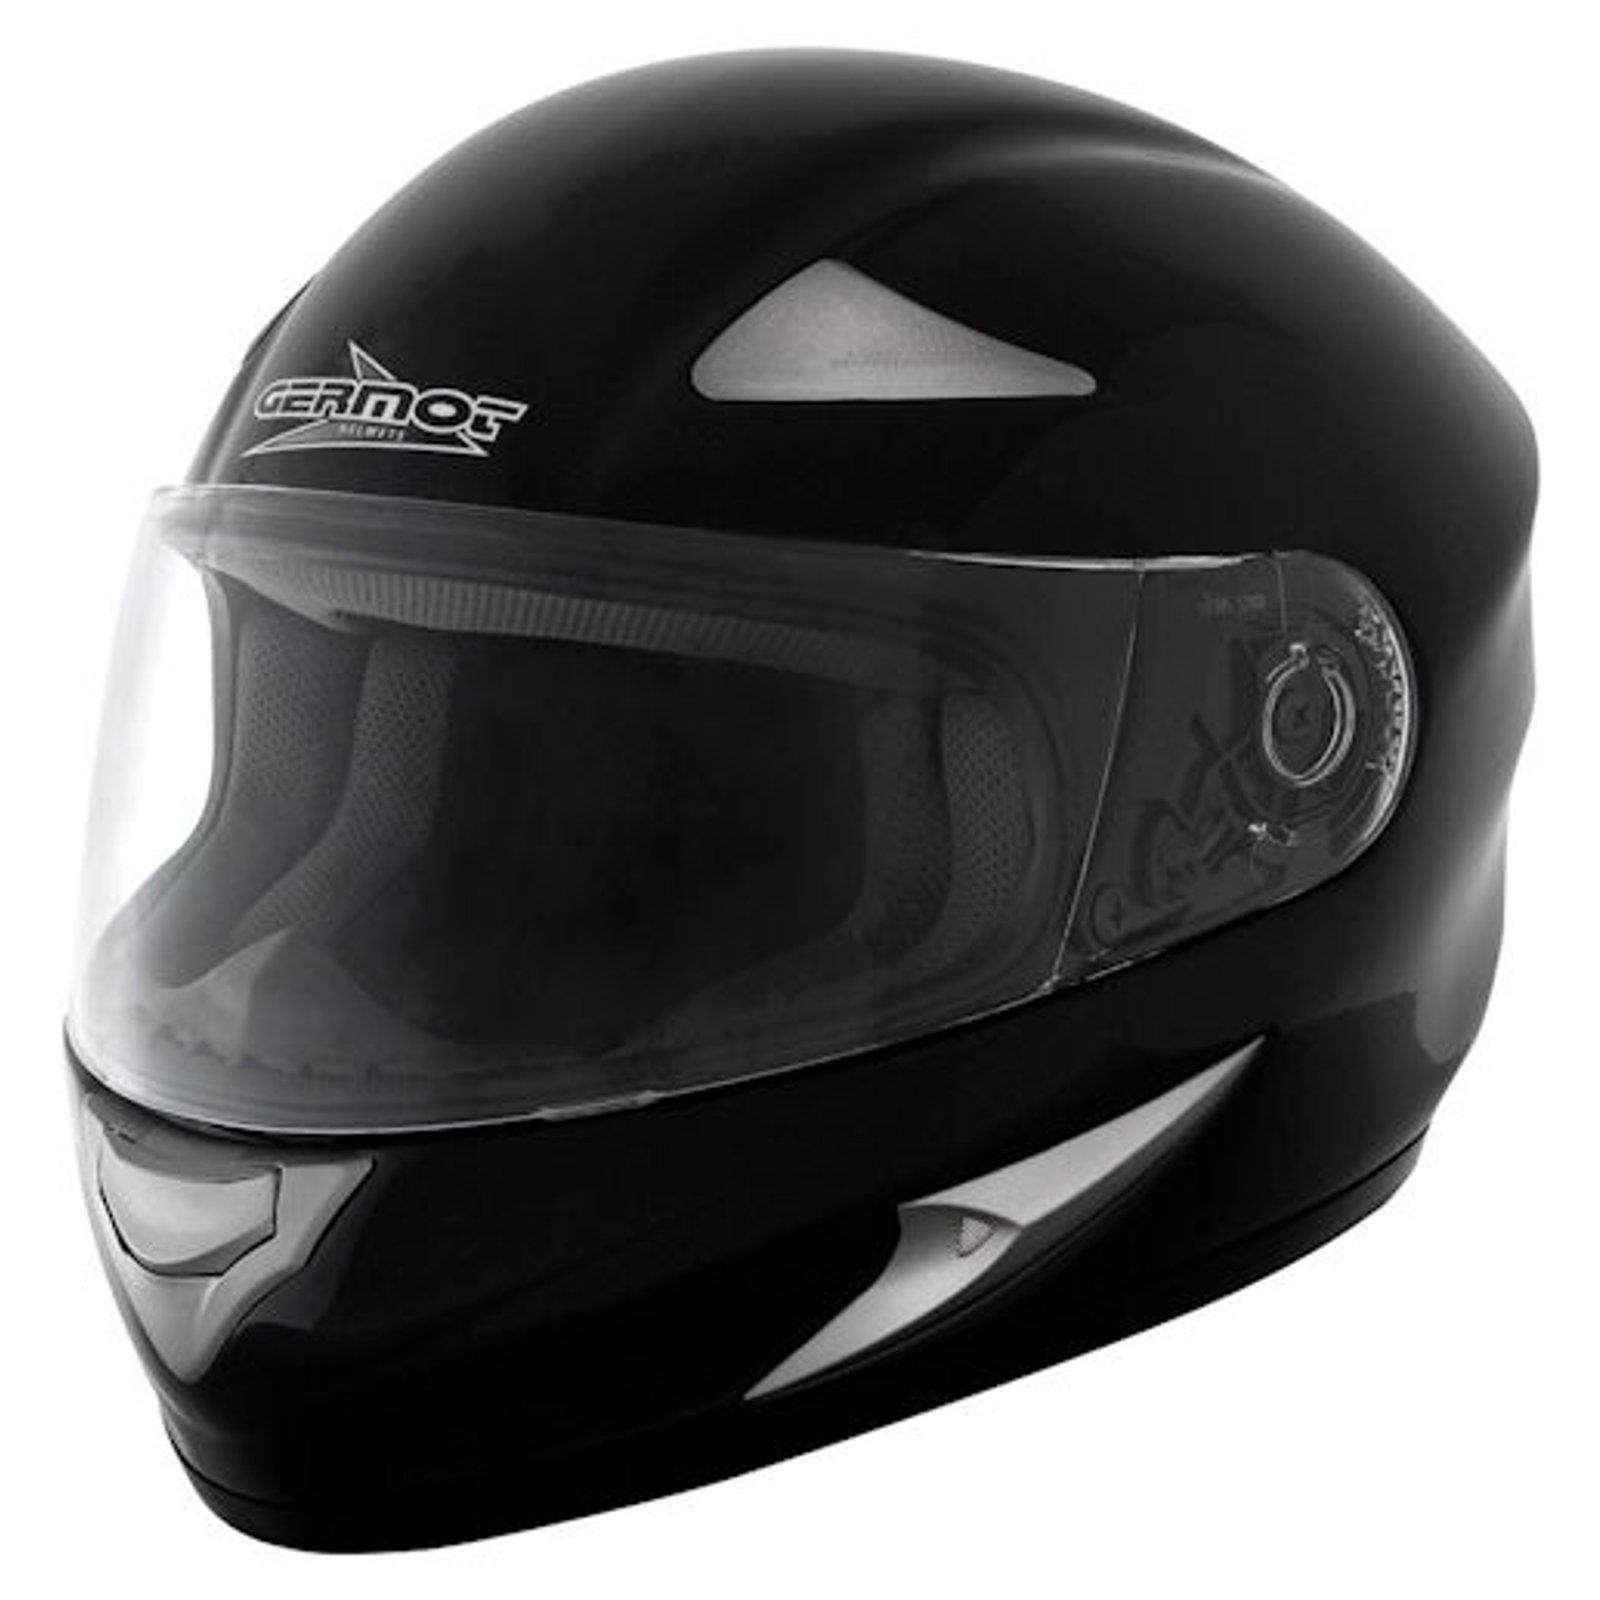 germot gm 720 integral helm bergr e schwarz motorrad. Black Bedroom Furniture Sets. Home Design Ideas